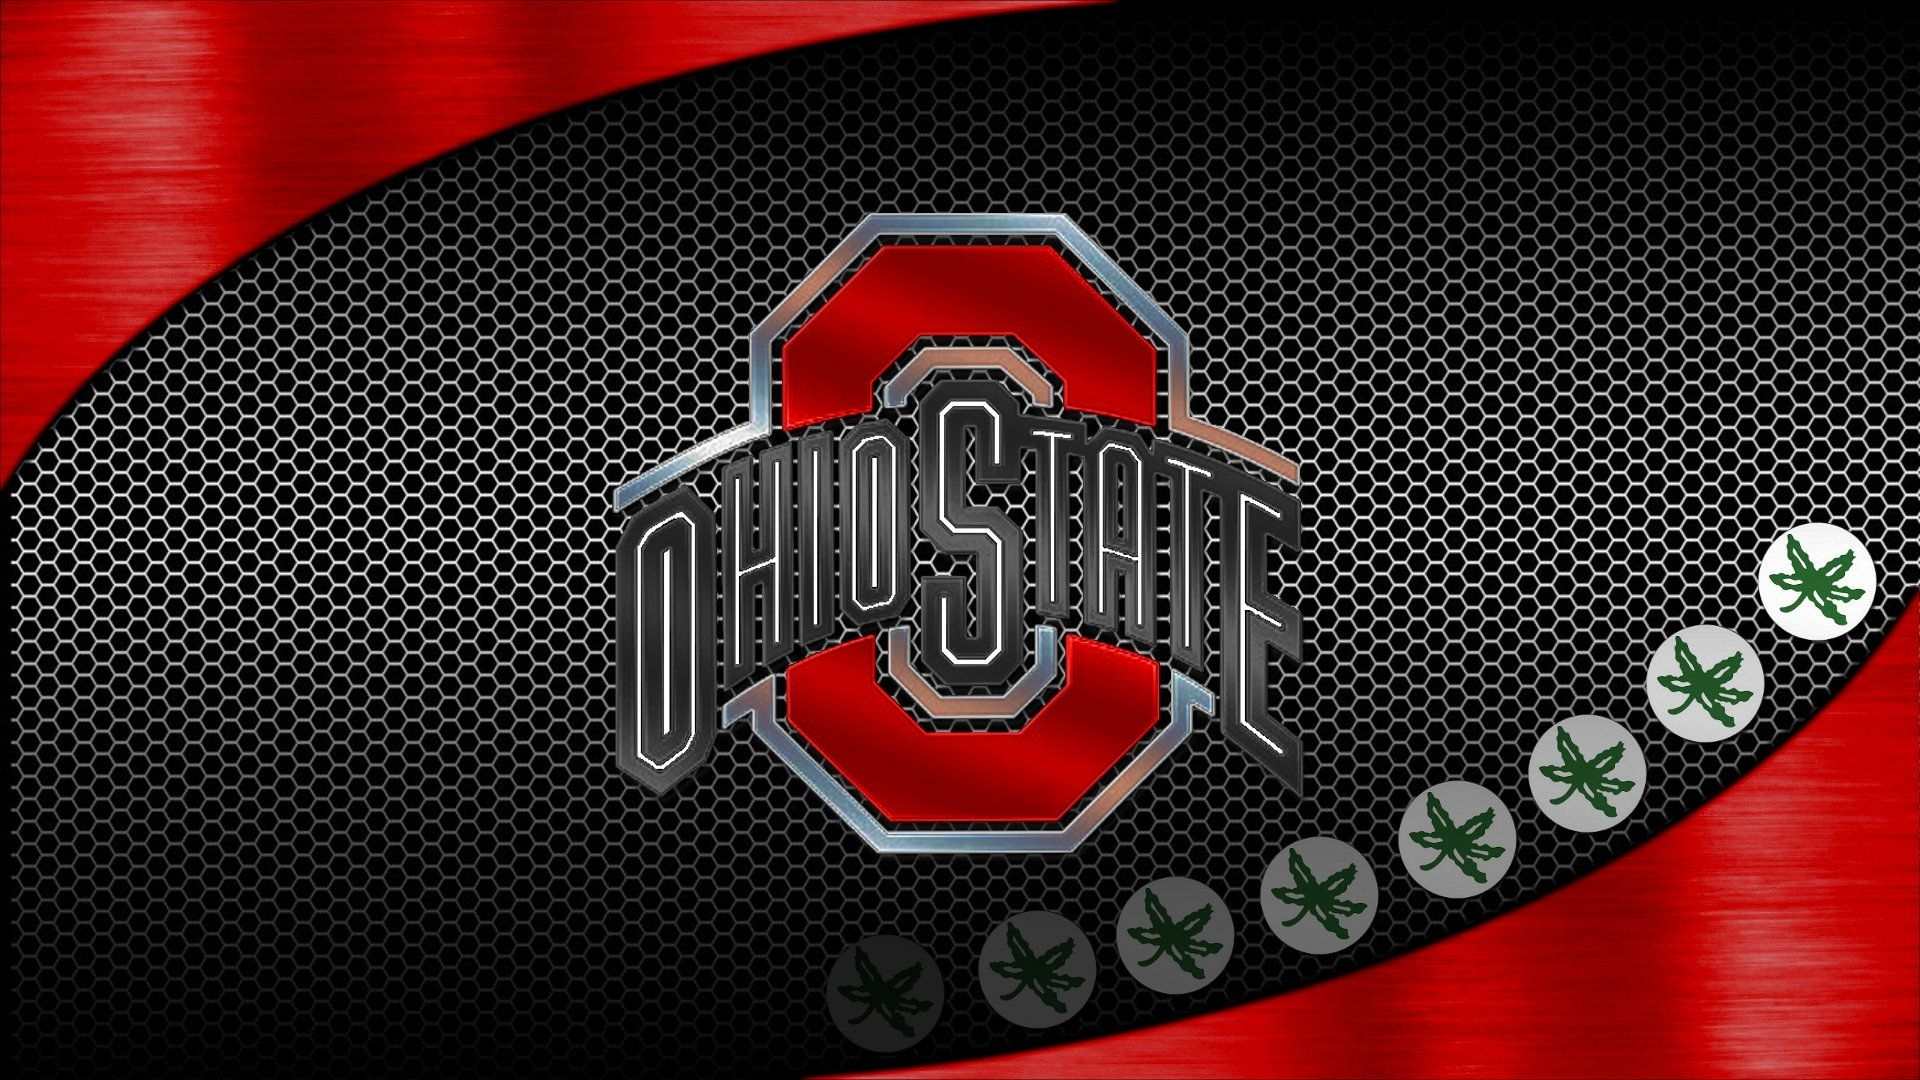 osu wallpaper 532 | ohio state buckeyes | pinterest | ohio